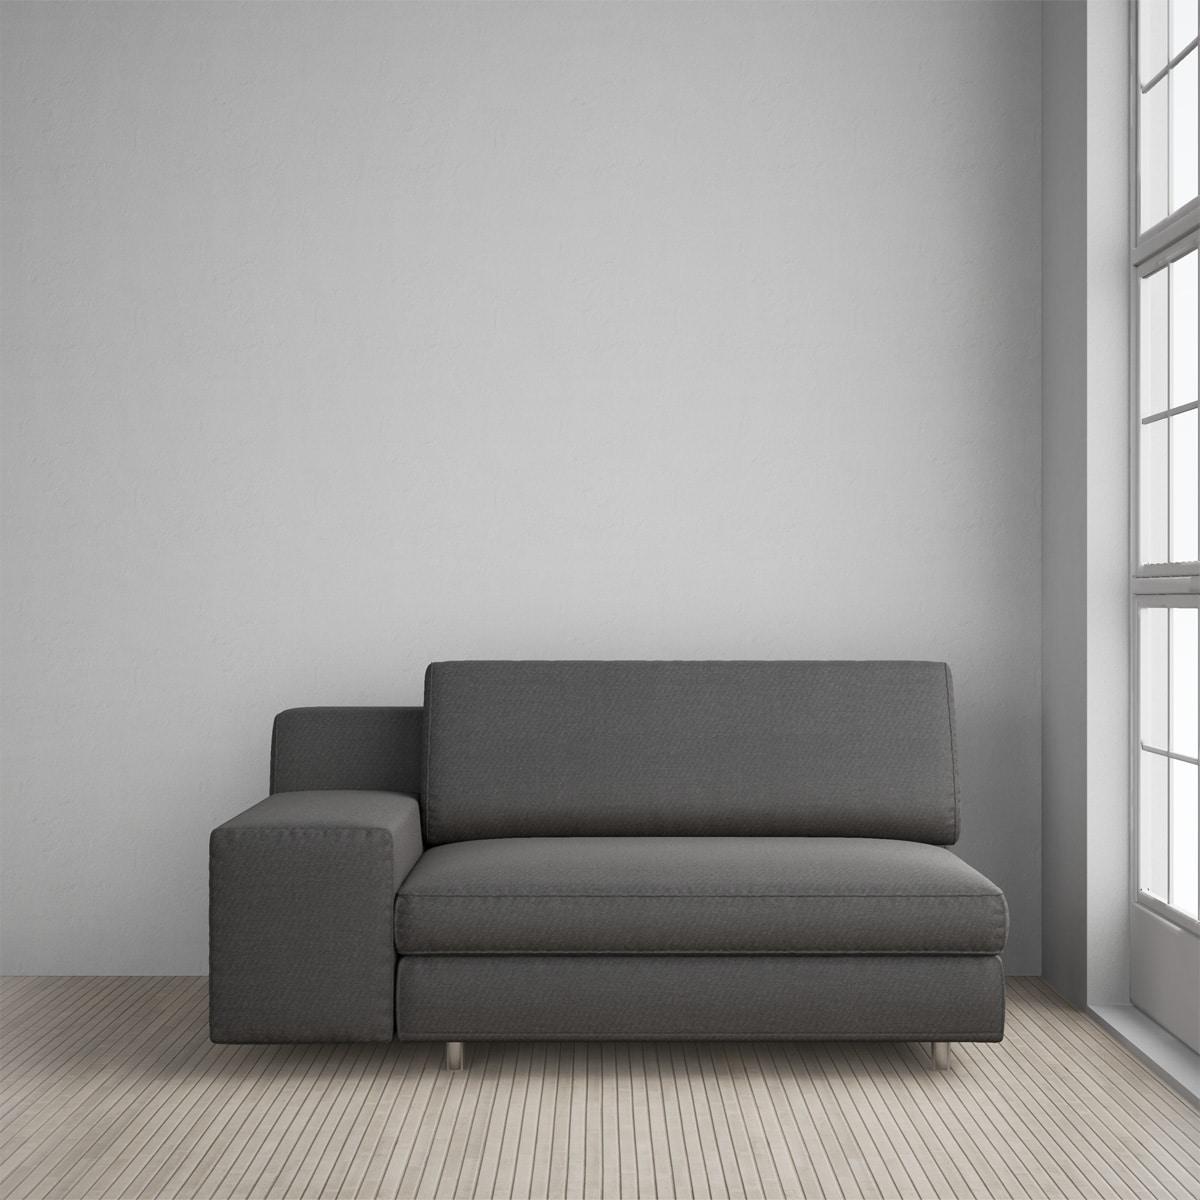 cassina mister sofa module 01 ue4arch. Black Bedroom Furniture Sets. Home Design Ideas